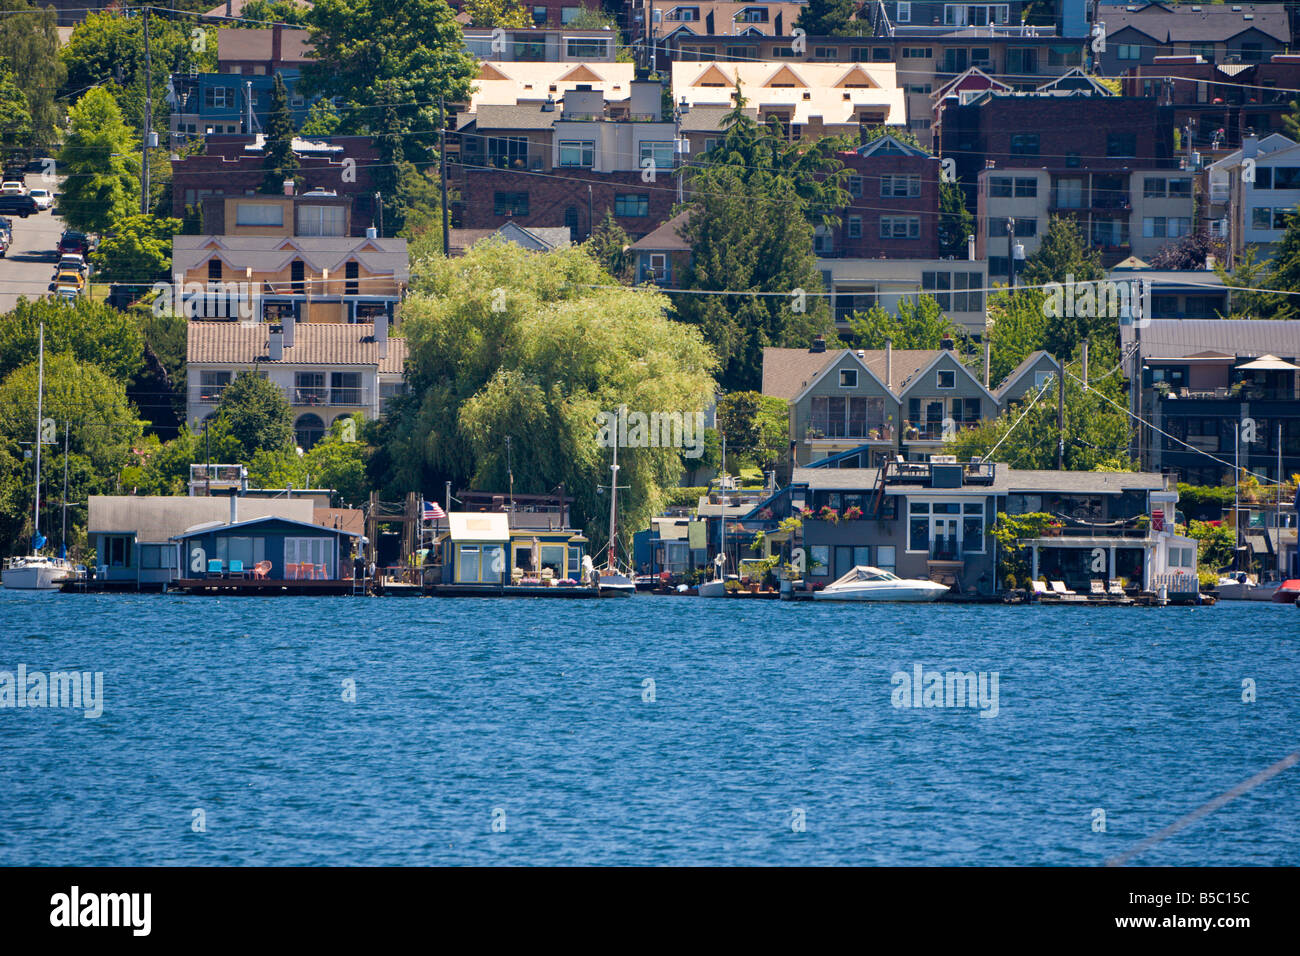 Floating Homes On Lake Union In Seattle Washington Stock